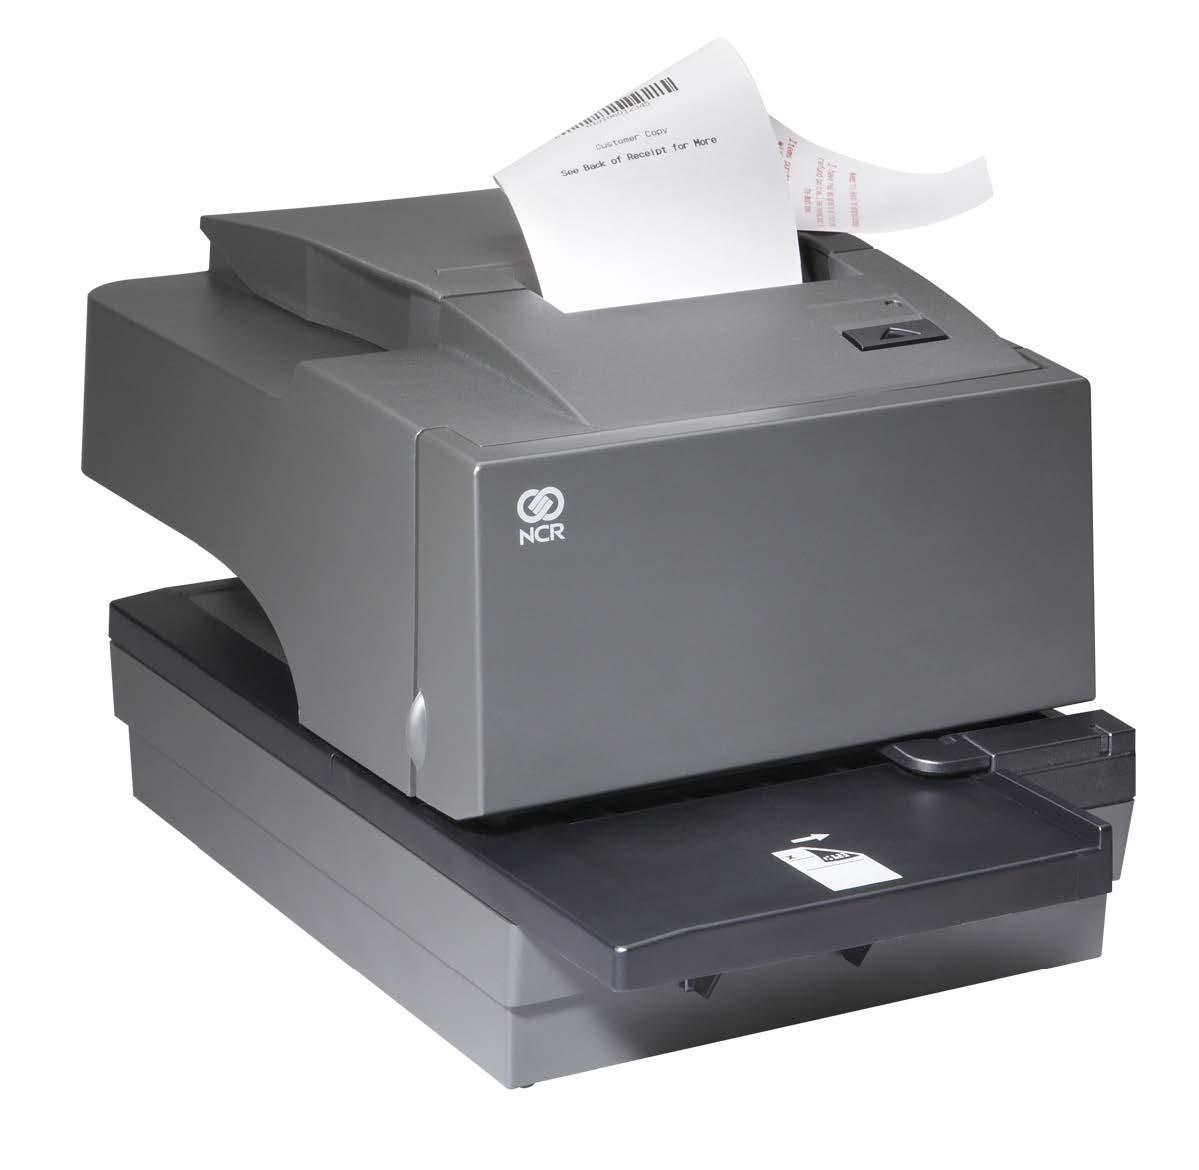 realpos-2-sided-multi-printer7168-ds